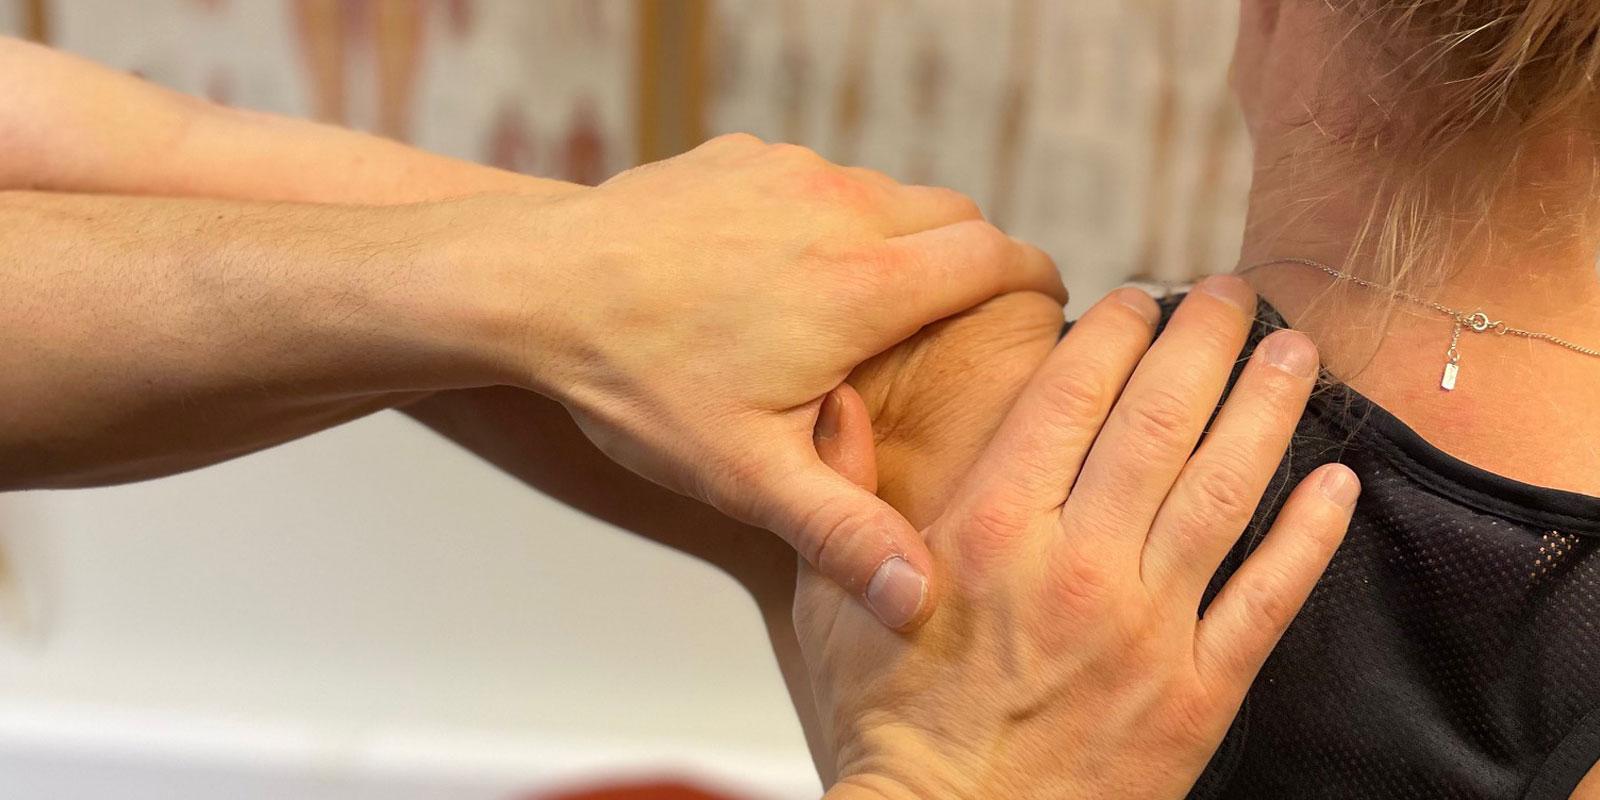 Ulin Sjykgymnastik/Fysioterapi Behandlingar Metoder